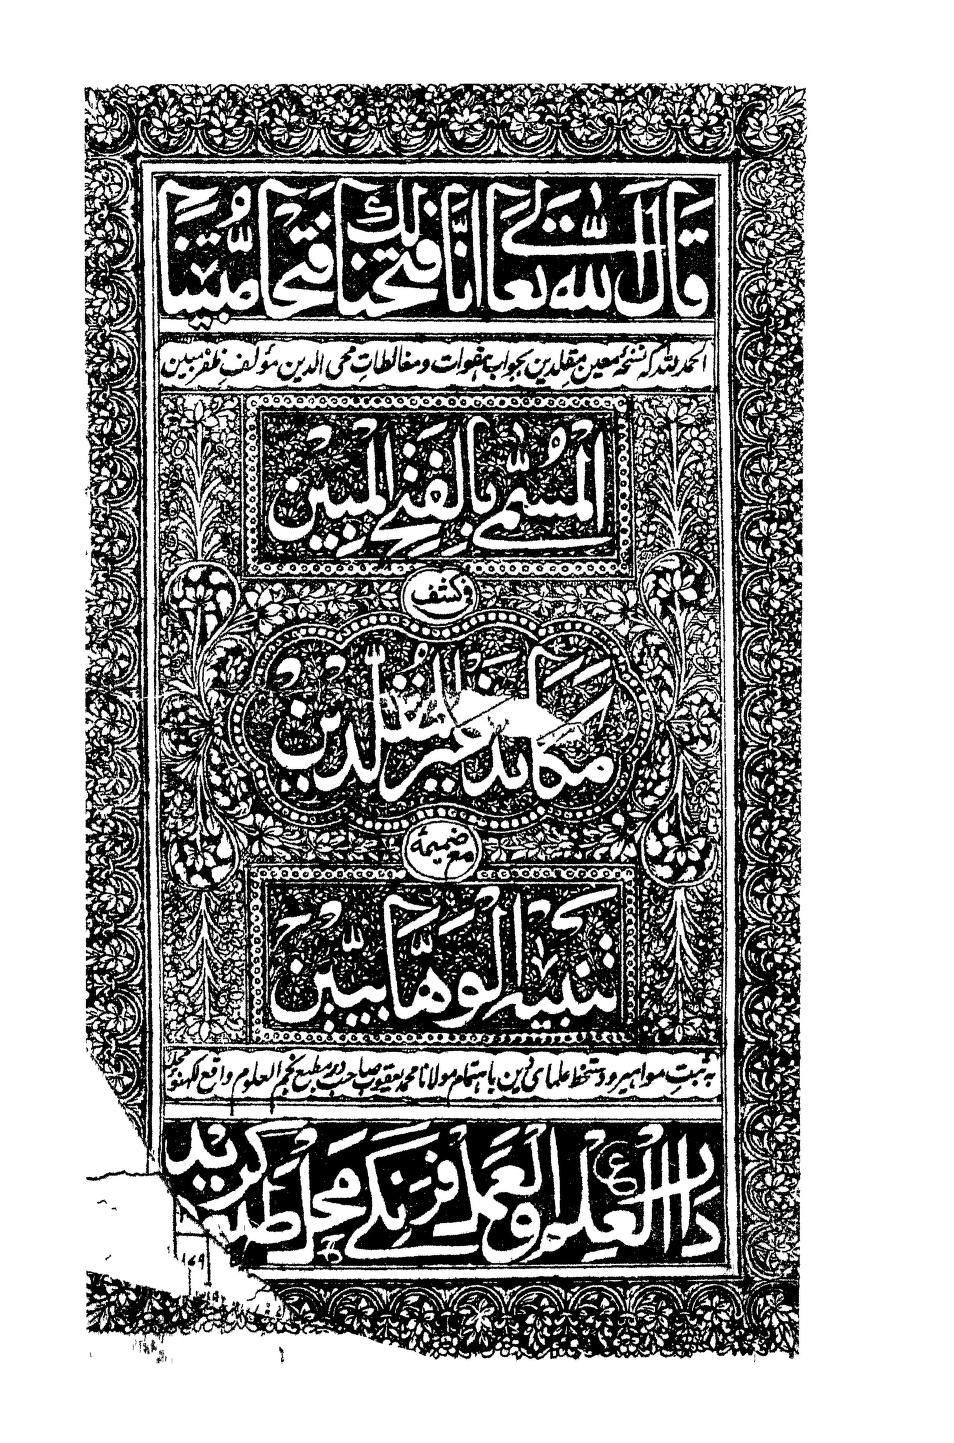 Deobandi books – radde wahhabiat – Fathul Mubeen – دیوبندی کتب ۔ رد وہابیت ۔ فتح المبین فی کشف المکائد الغیر مقلدین مع ضمیمہ تنبیہ الوھابیین